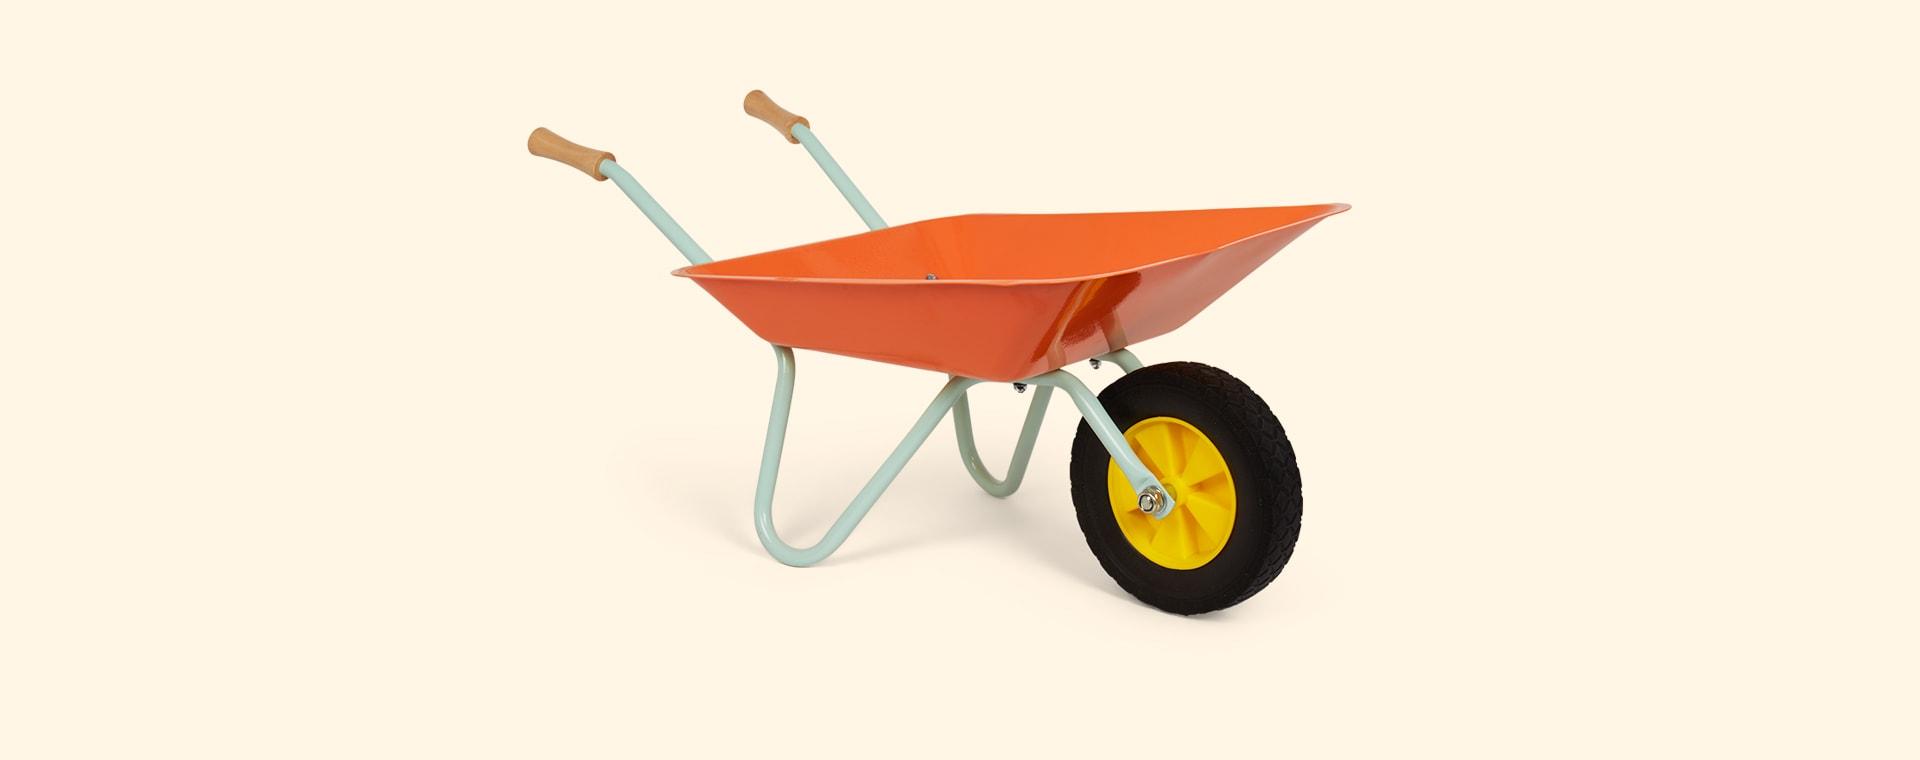 Orange Janod Metal Wheelbarrow